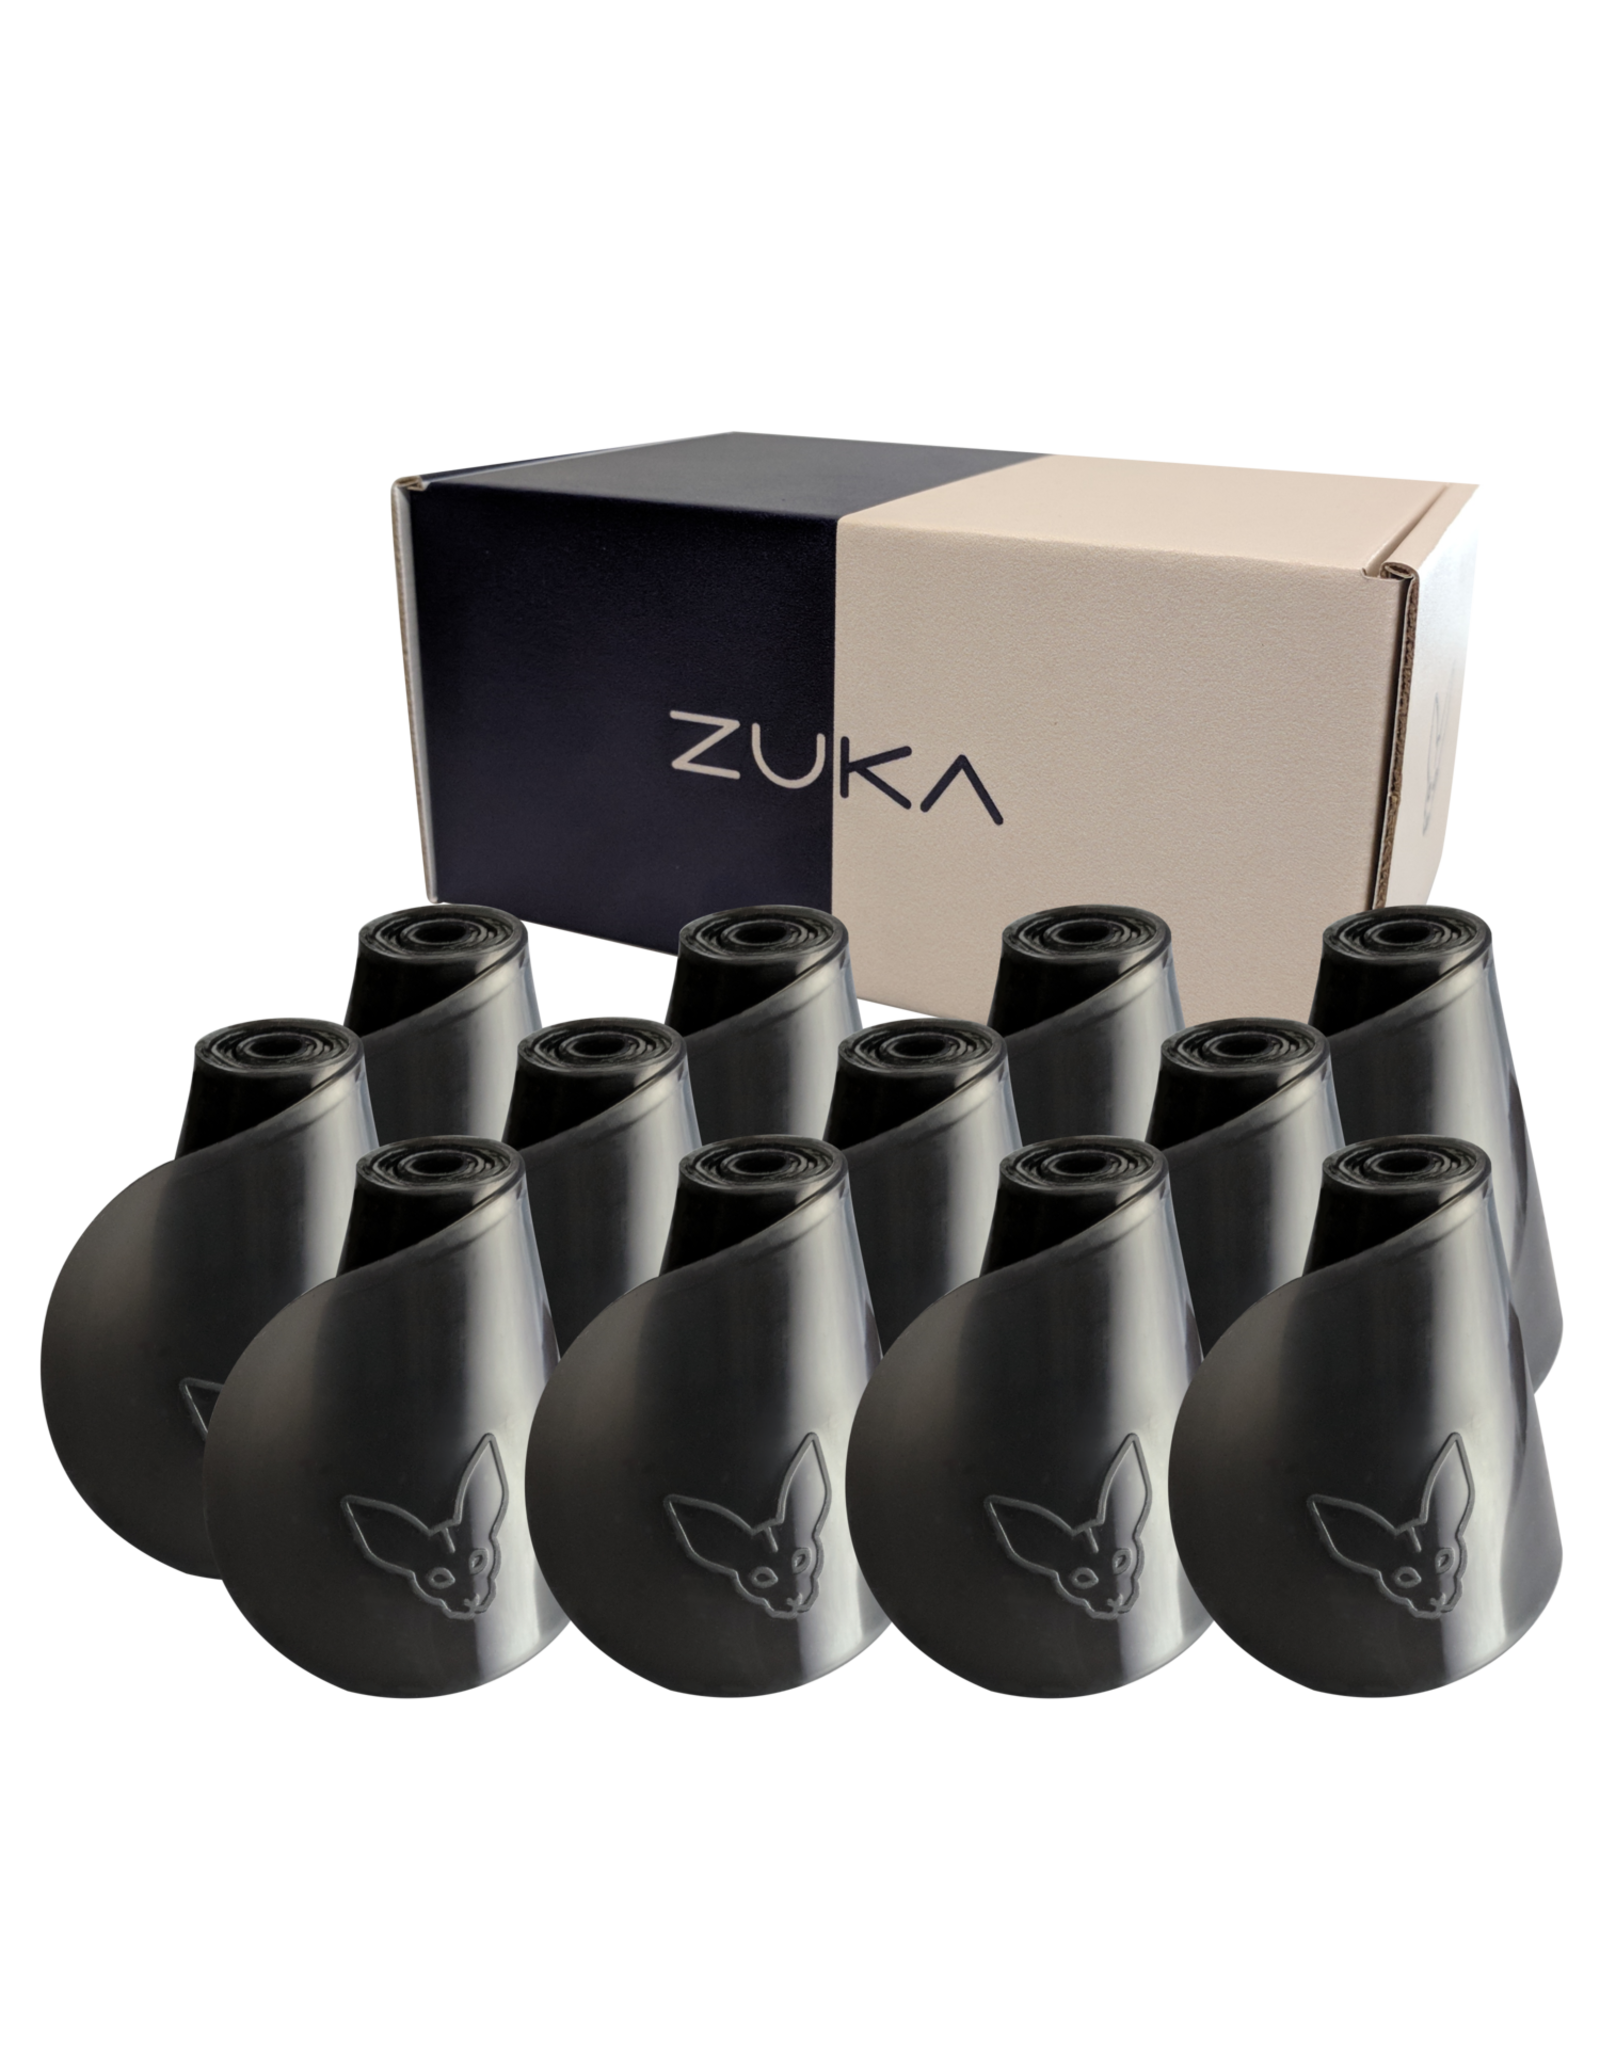 Zuka Zuka Cape Seal System